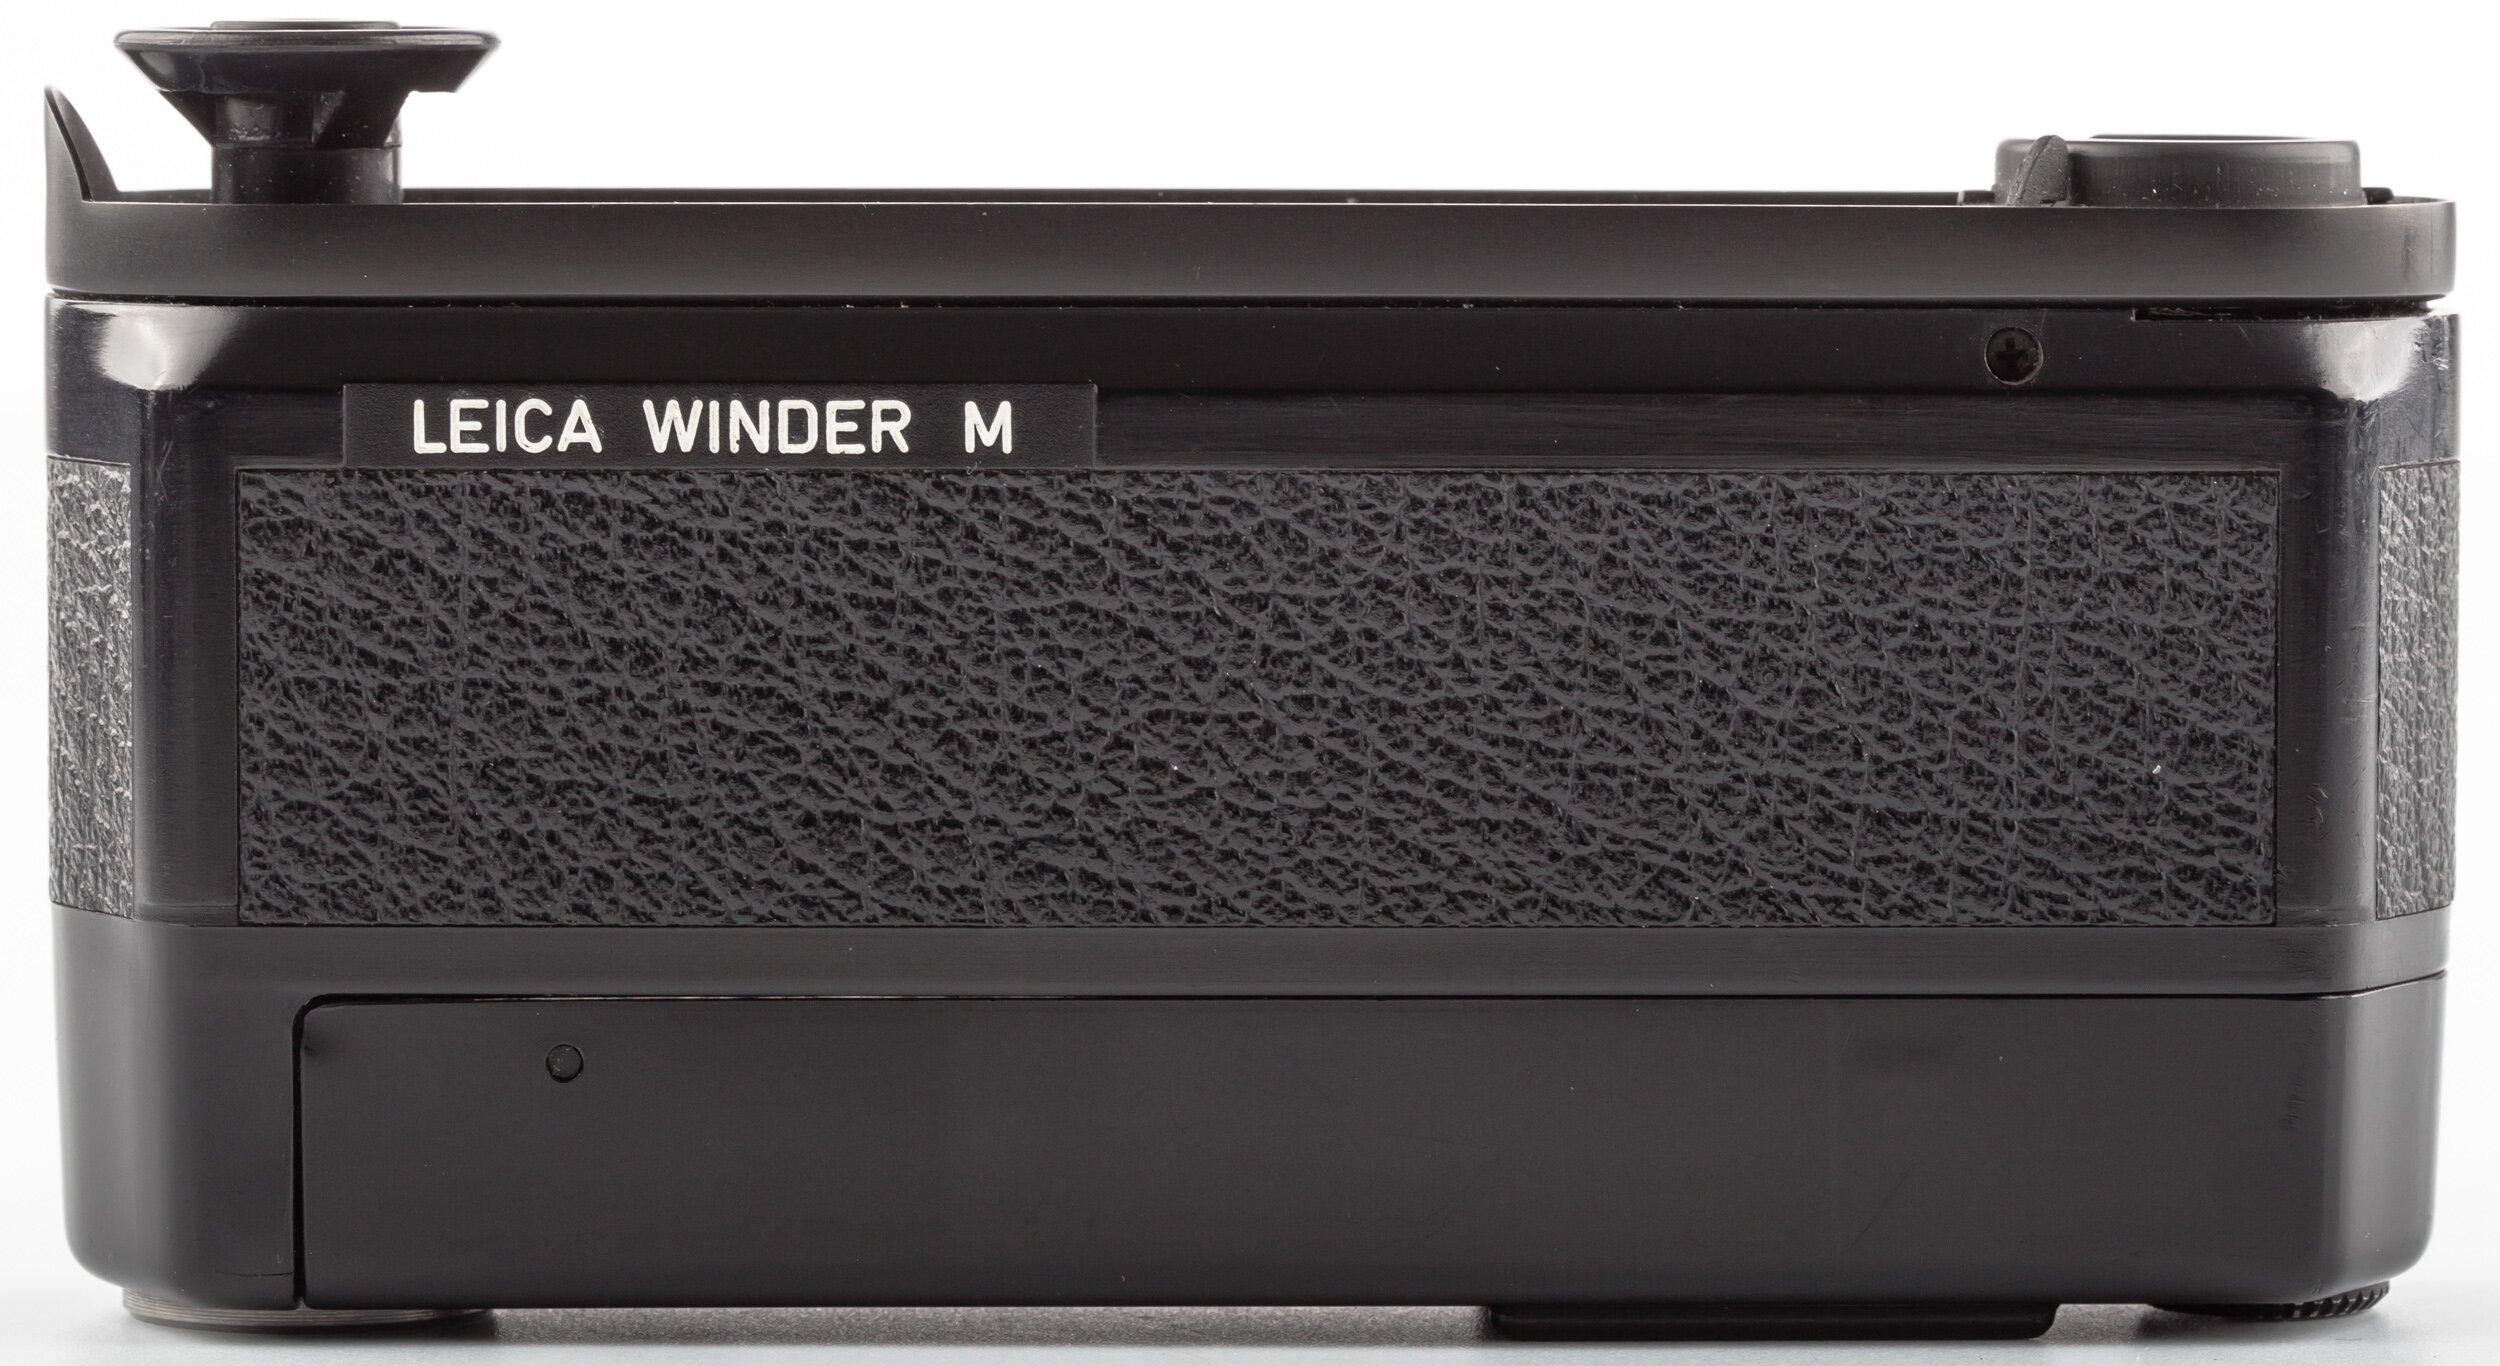 Leica Winder M 14403 + 14402